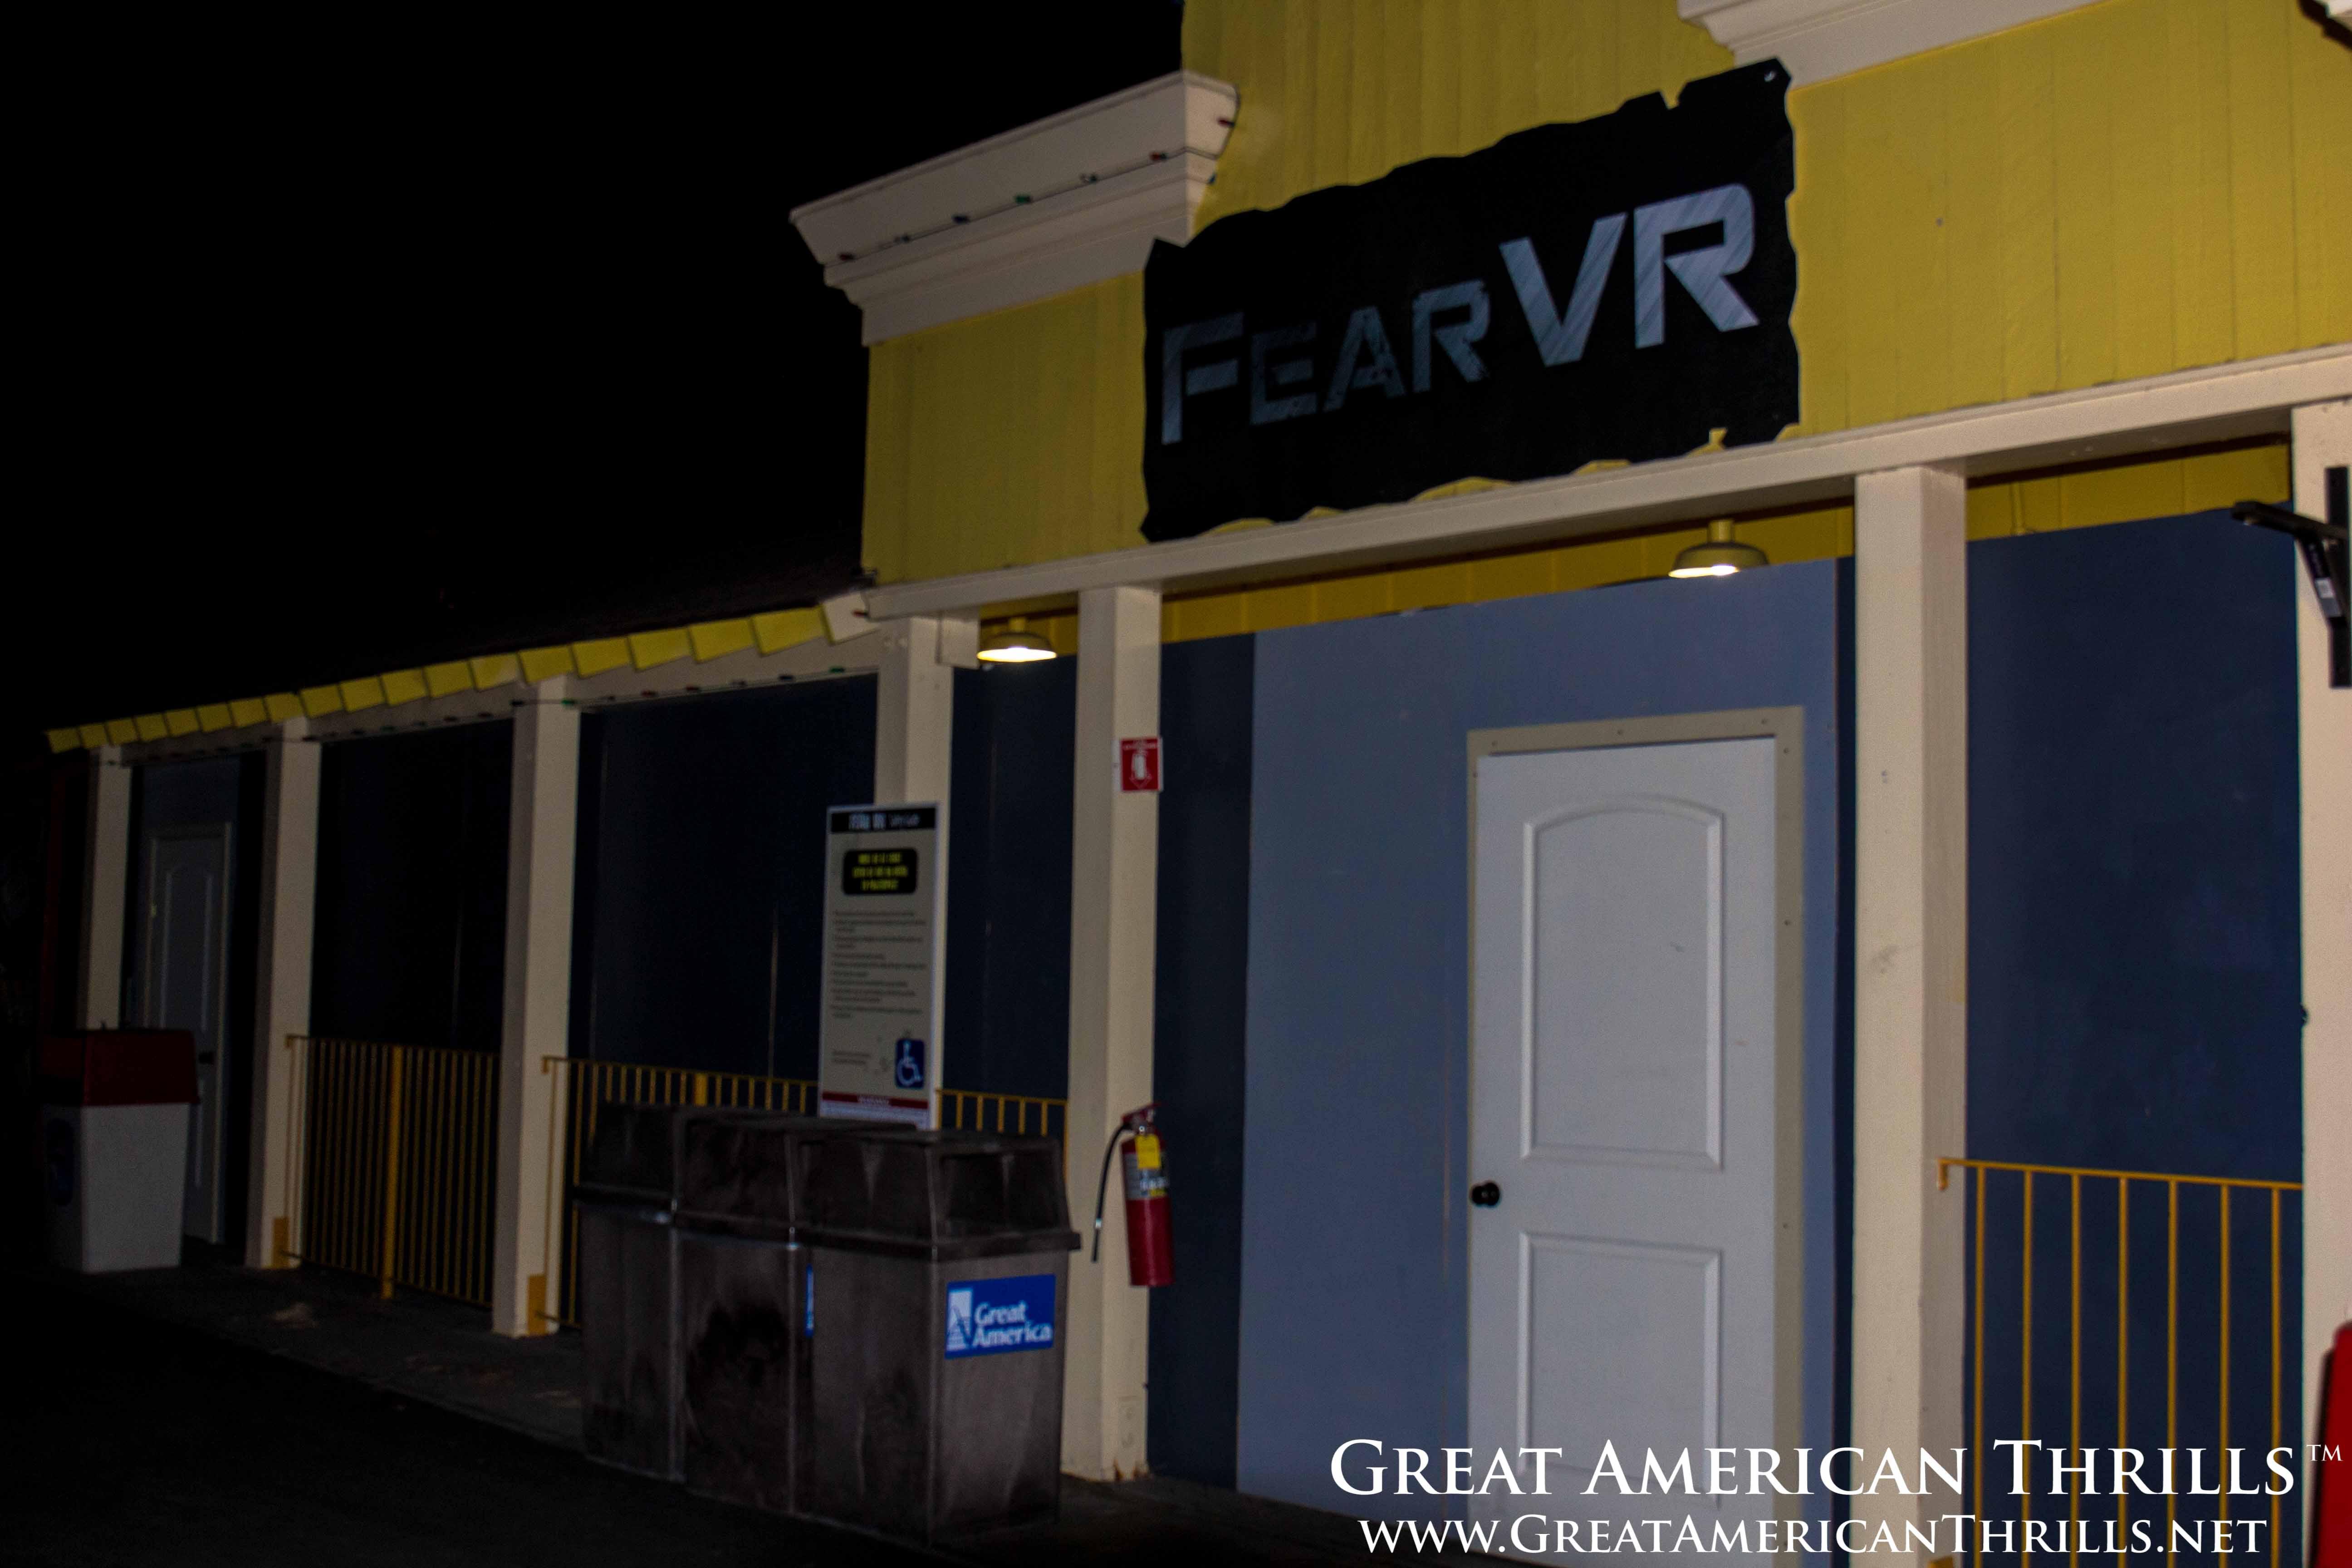 Fear: 5150 at California's Great America